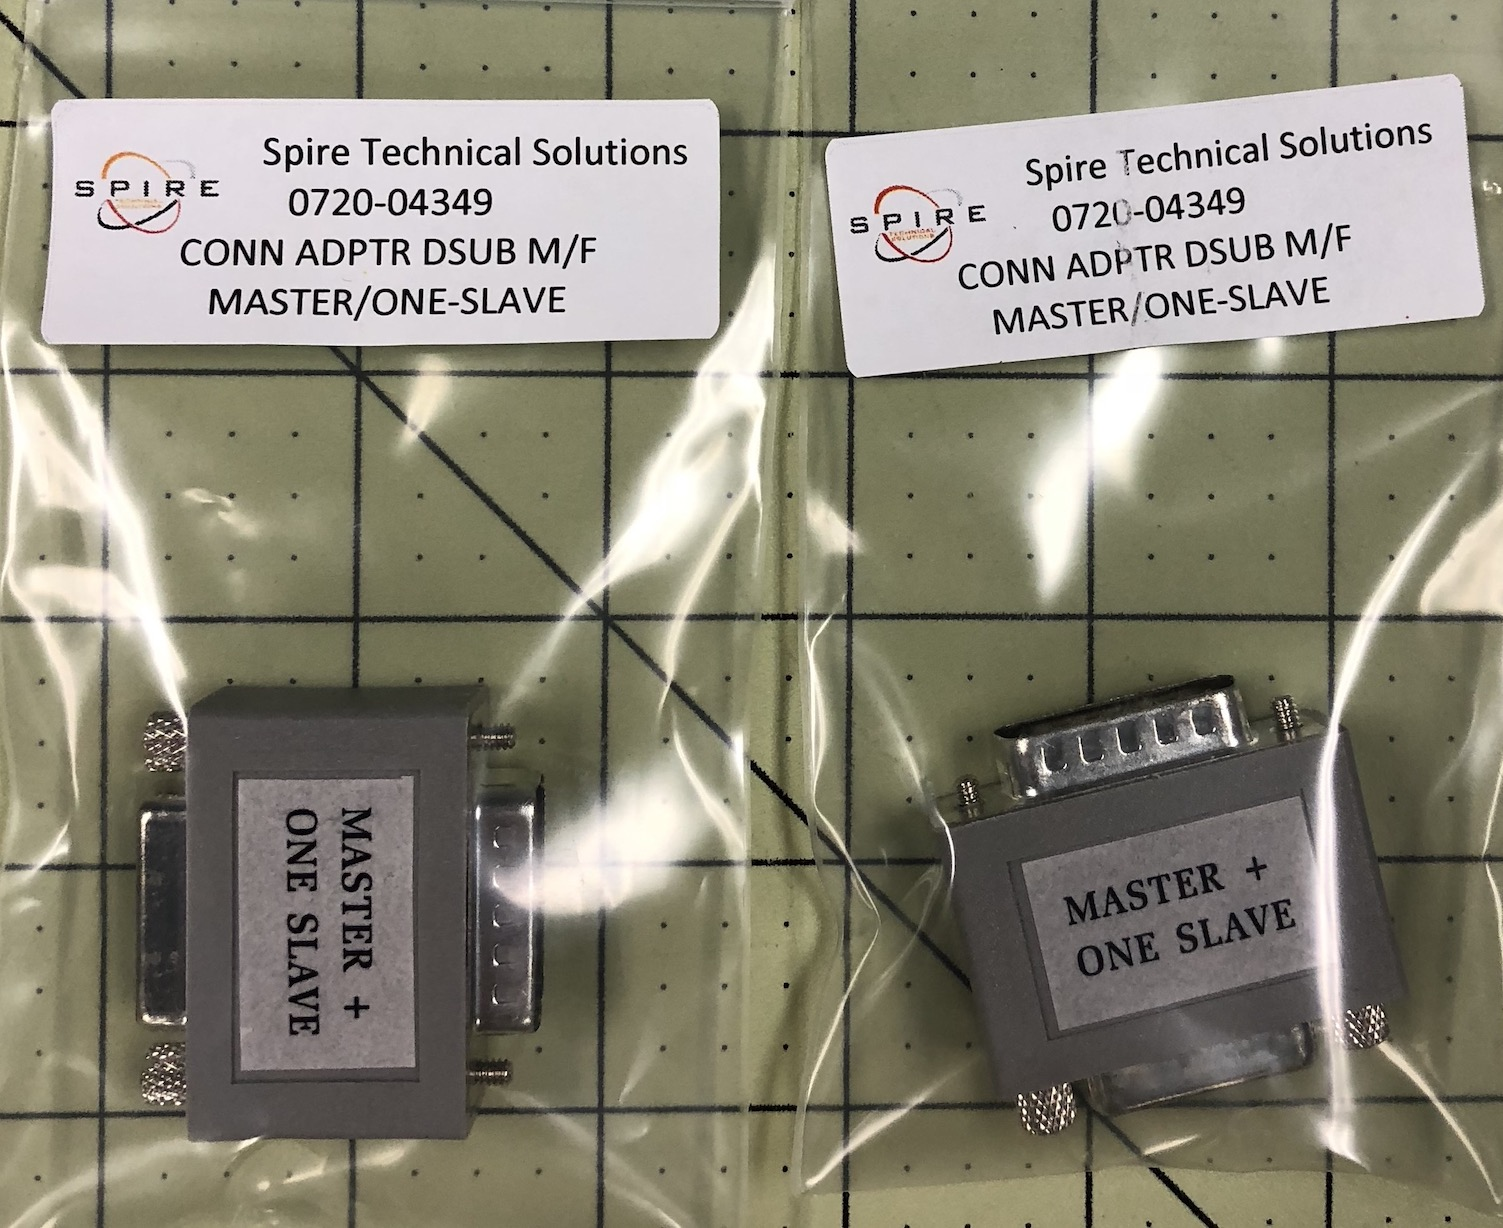 Adaptor D Sub M/F M/One-Slave